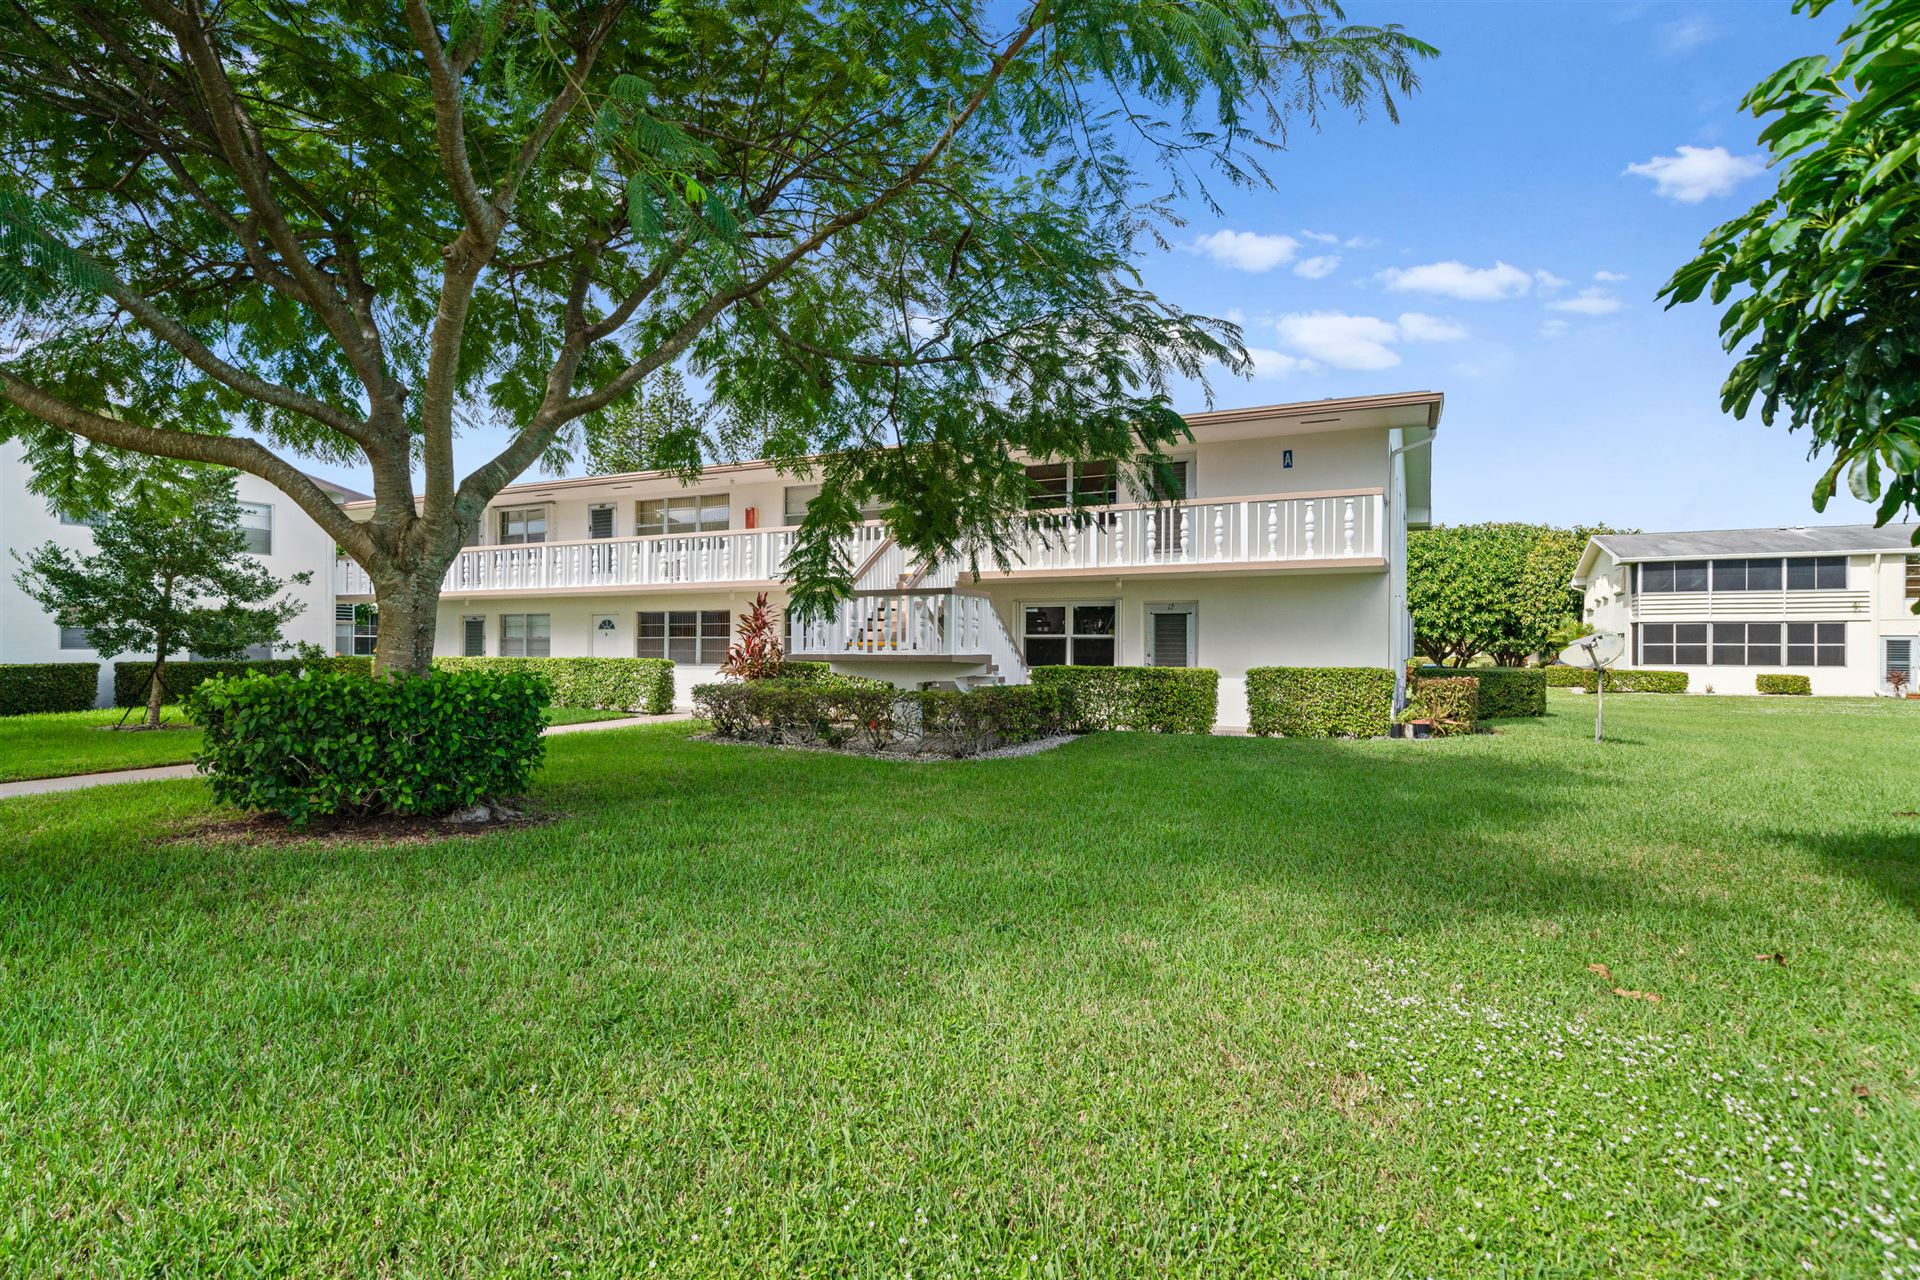 11 Cambridge A, West Palm Beach, FL 33417 - #: RX-10574867